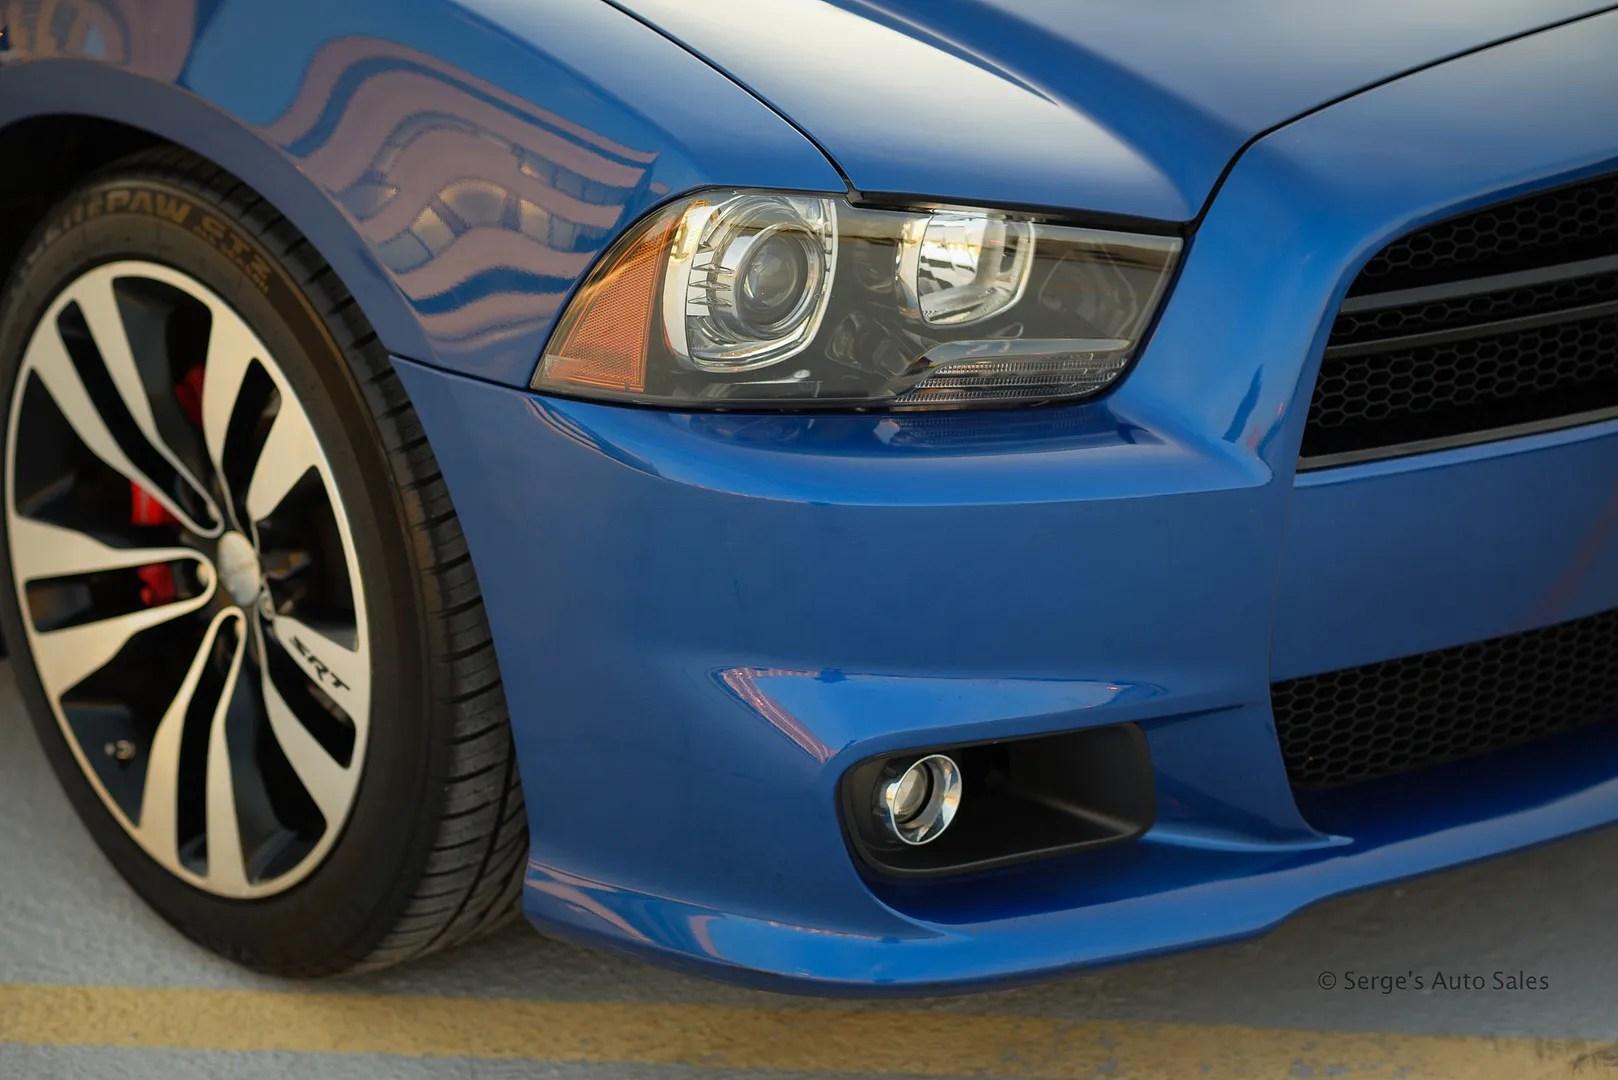 photo charger-serges-auto-sales-northeast-pa-2012-srt8--25_zpsge8splw9.jpg